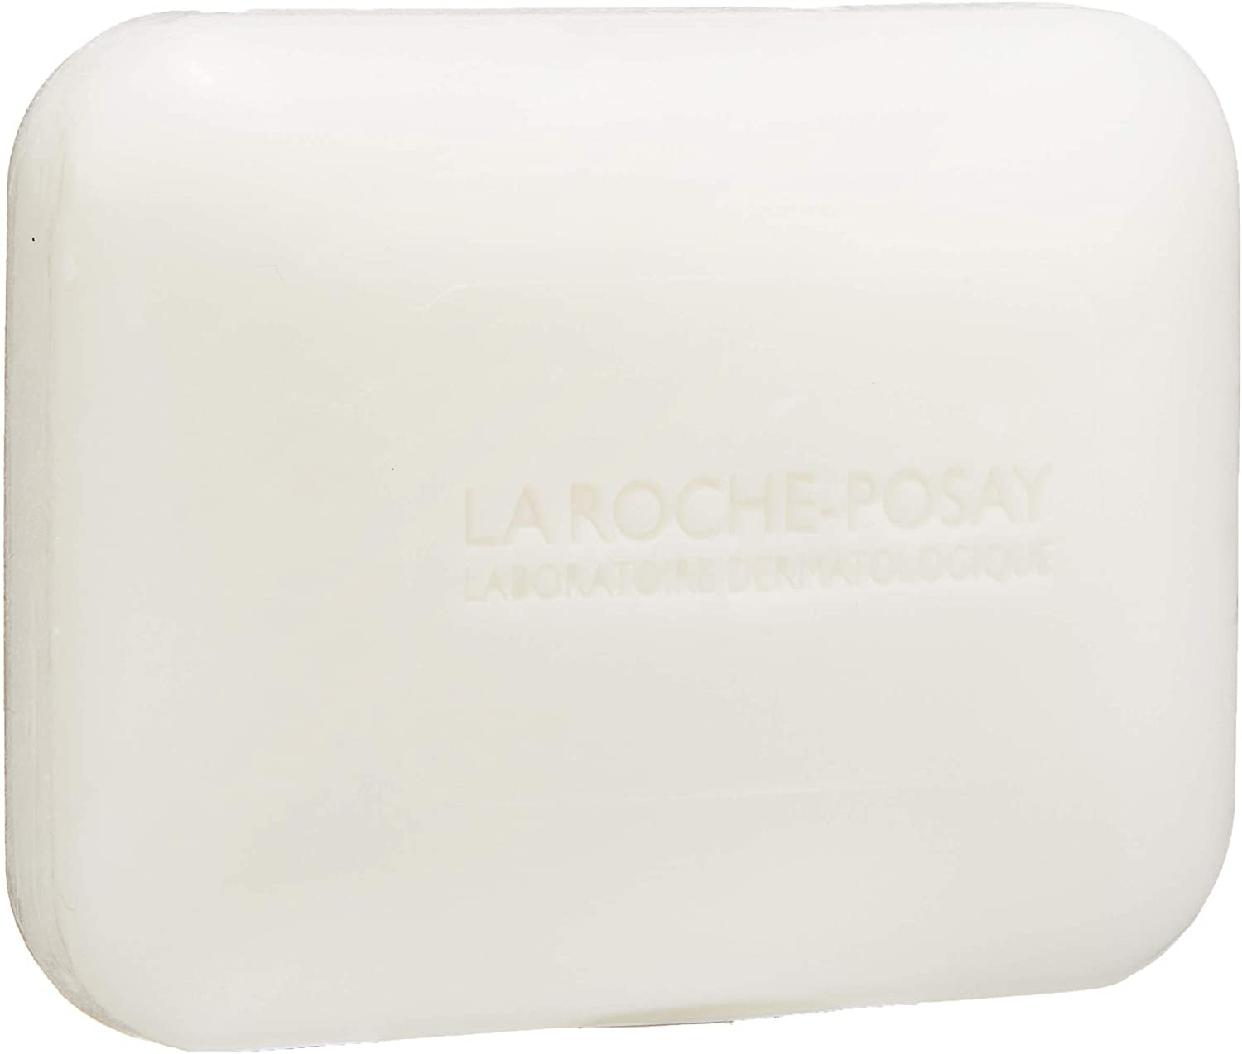 LAROCHE-POSAY(ラ ロッシュ ポゼ) リピカ シューグラ クレンジングバーの商品画像2